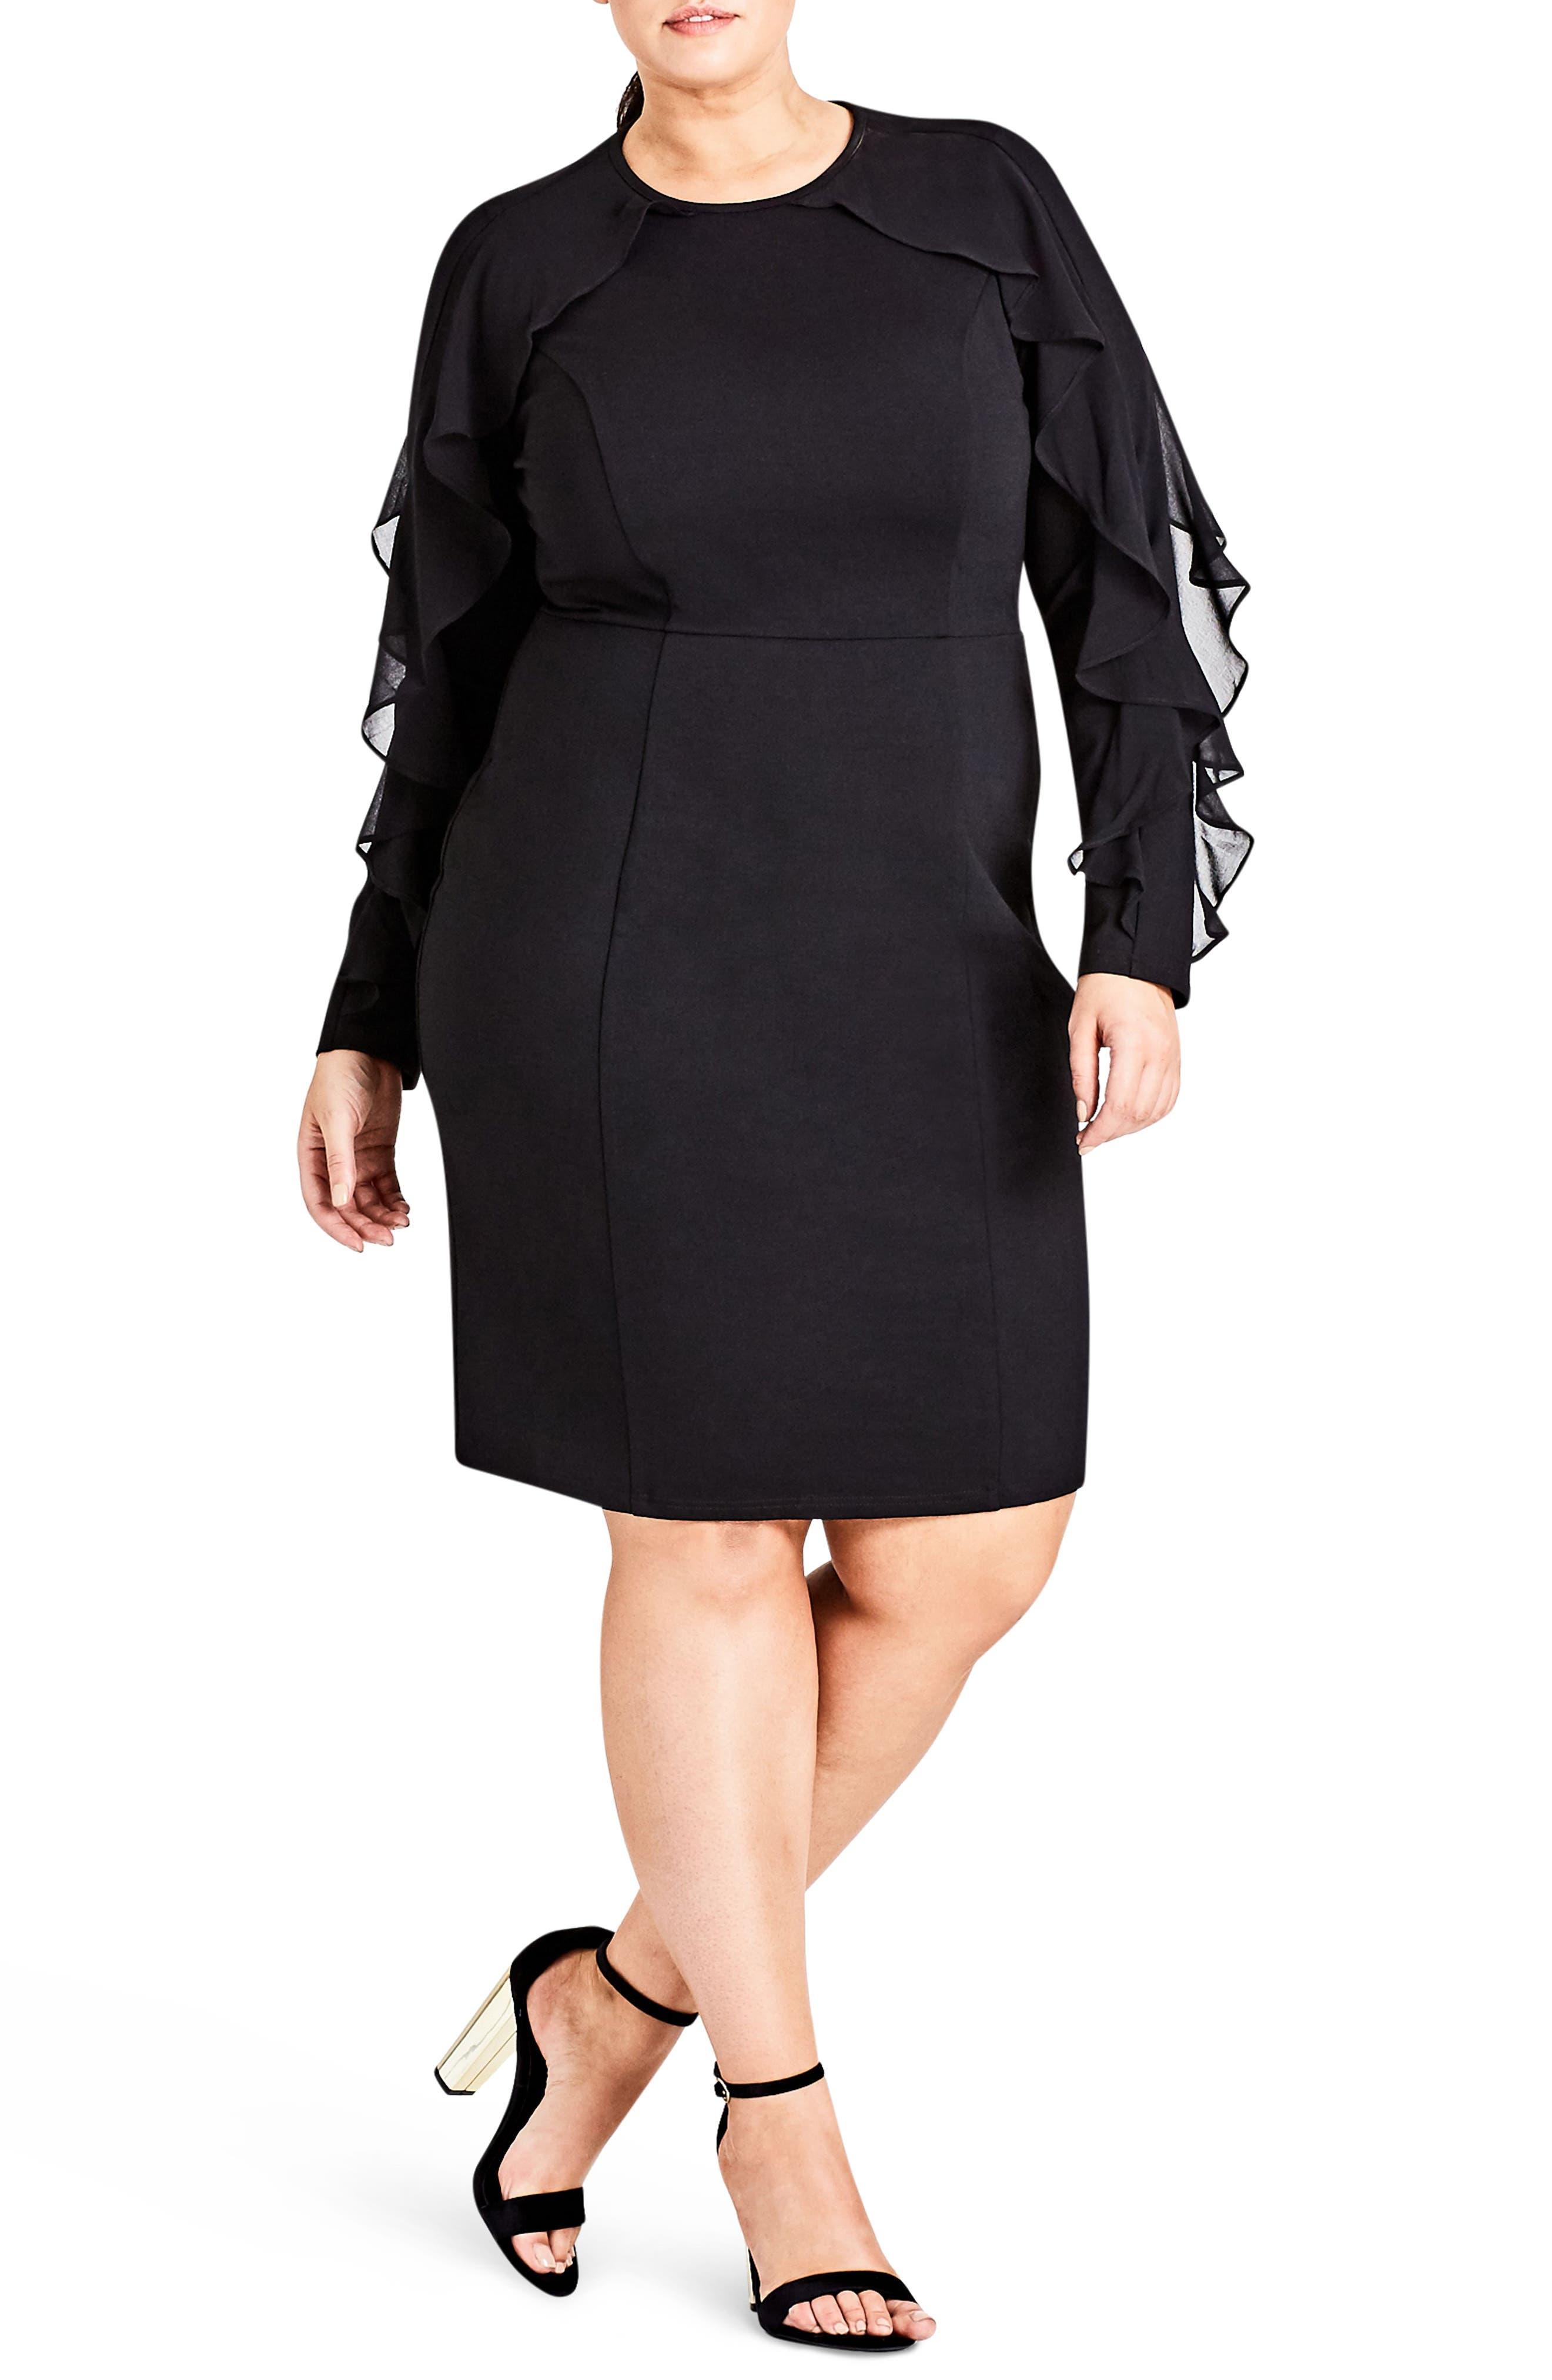 Chic City Romantic Sleeve Sheath Dress,                         Main,                         color, Black